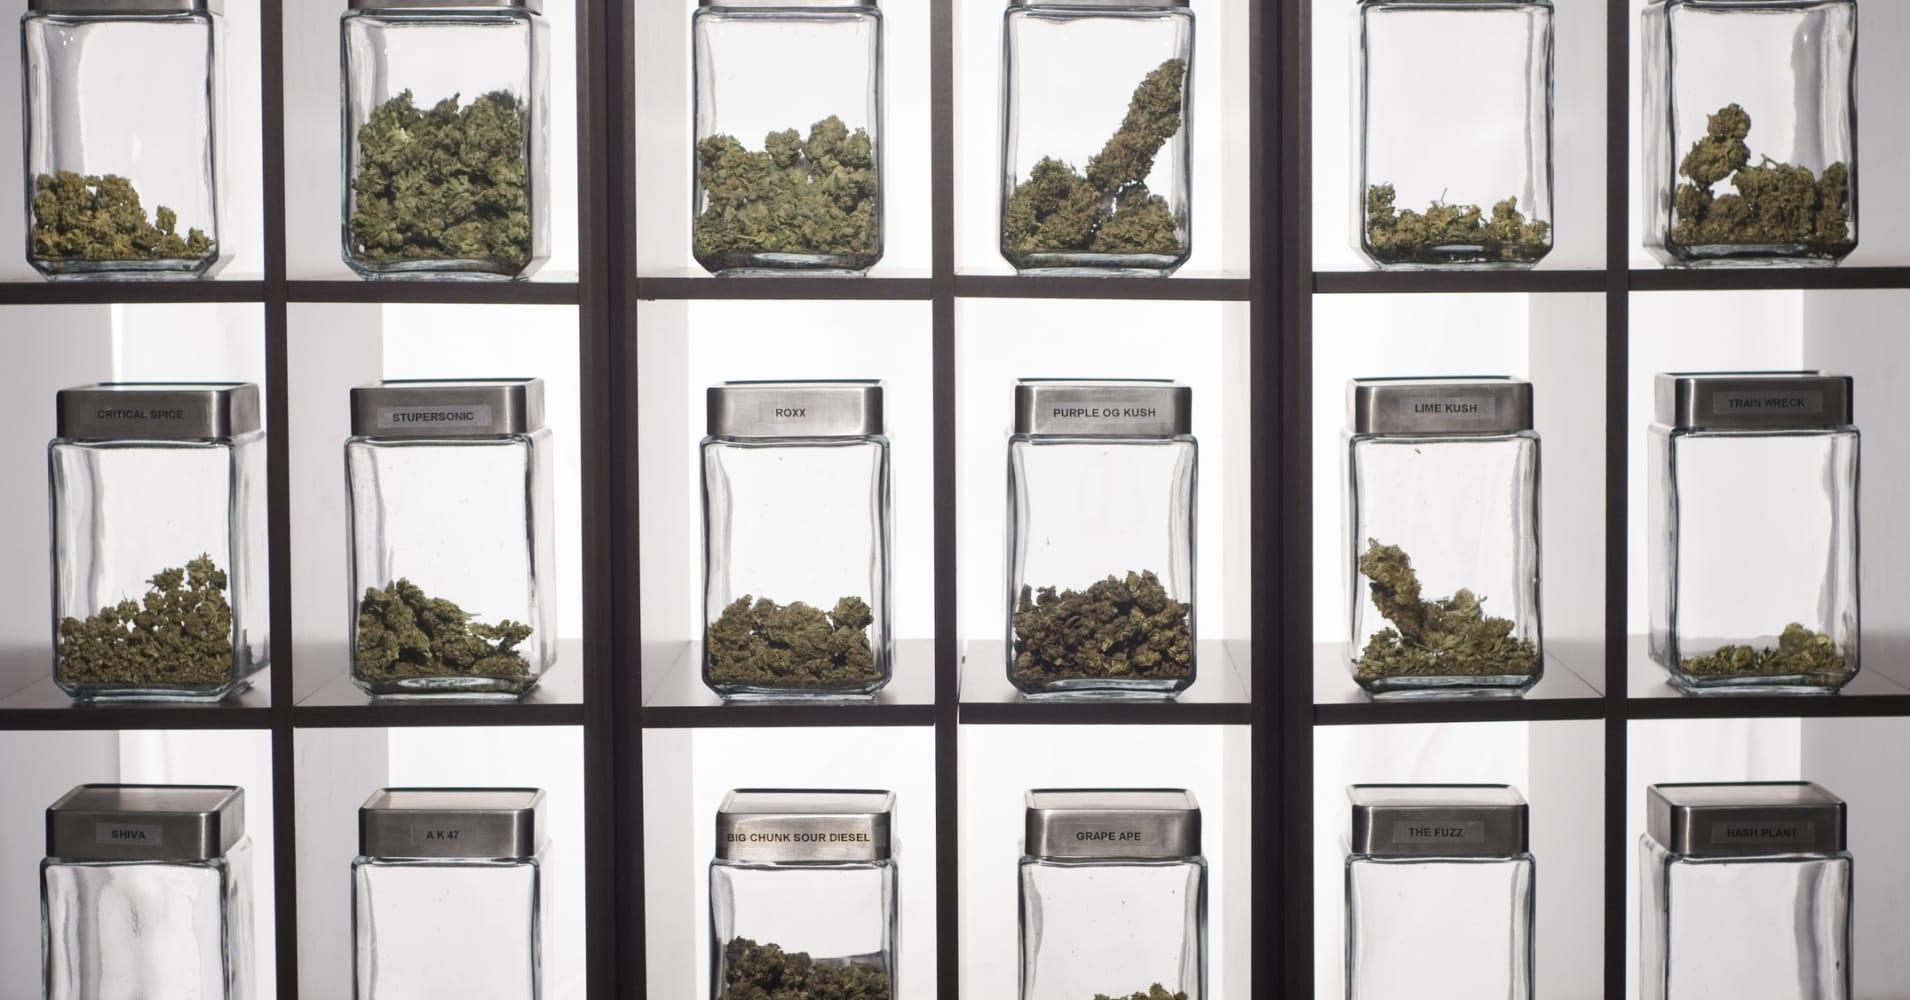 Irs said to be auditing colorado marijuana businesses falaconquin